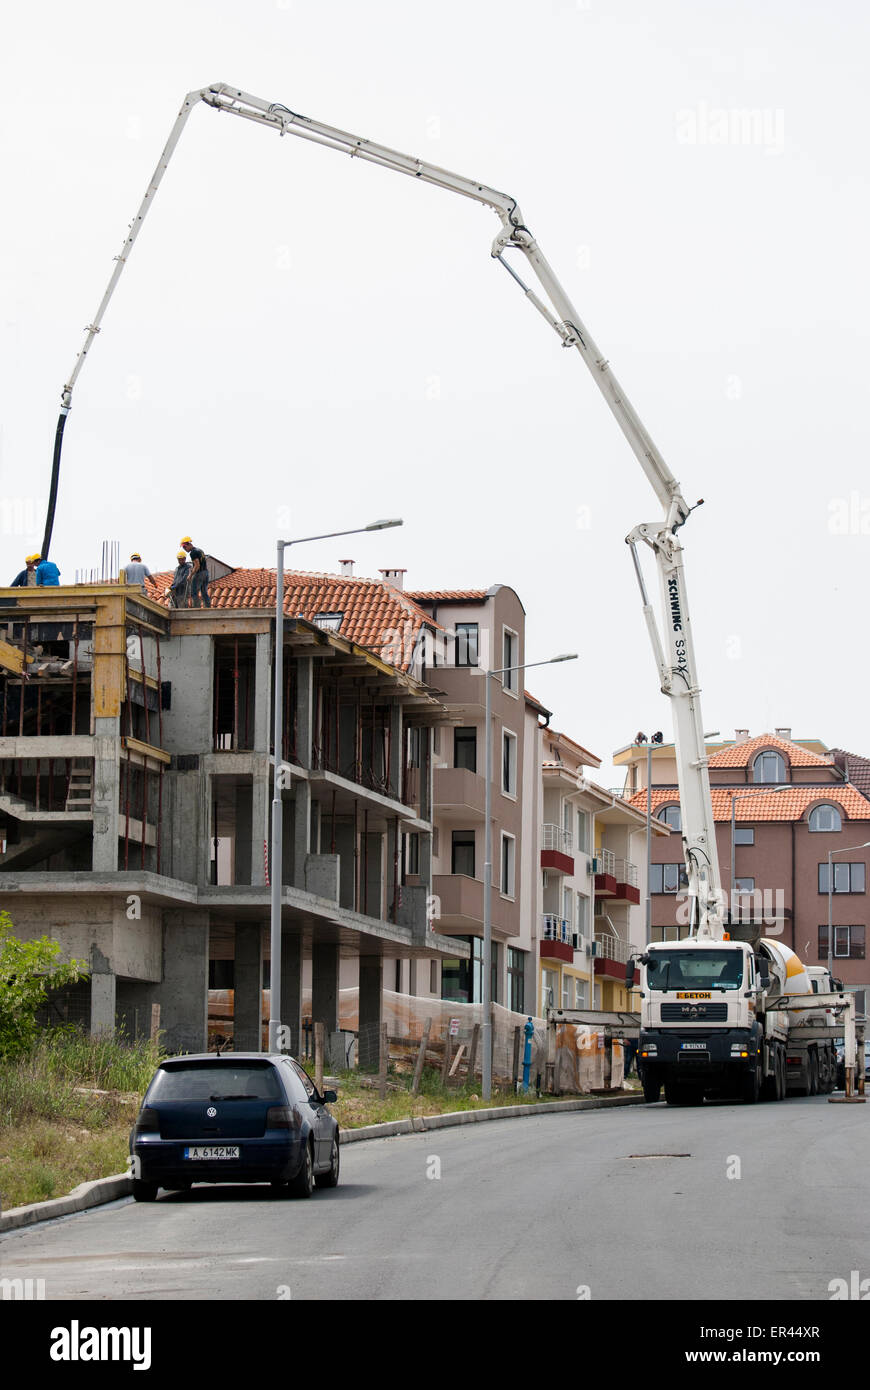 Wohnungsbau in Nessebar, Bulgarien Stockbild